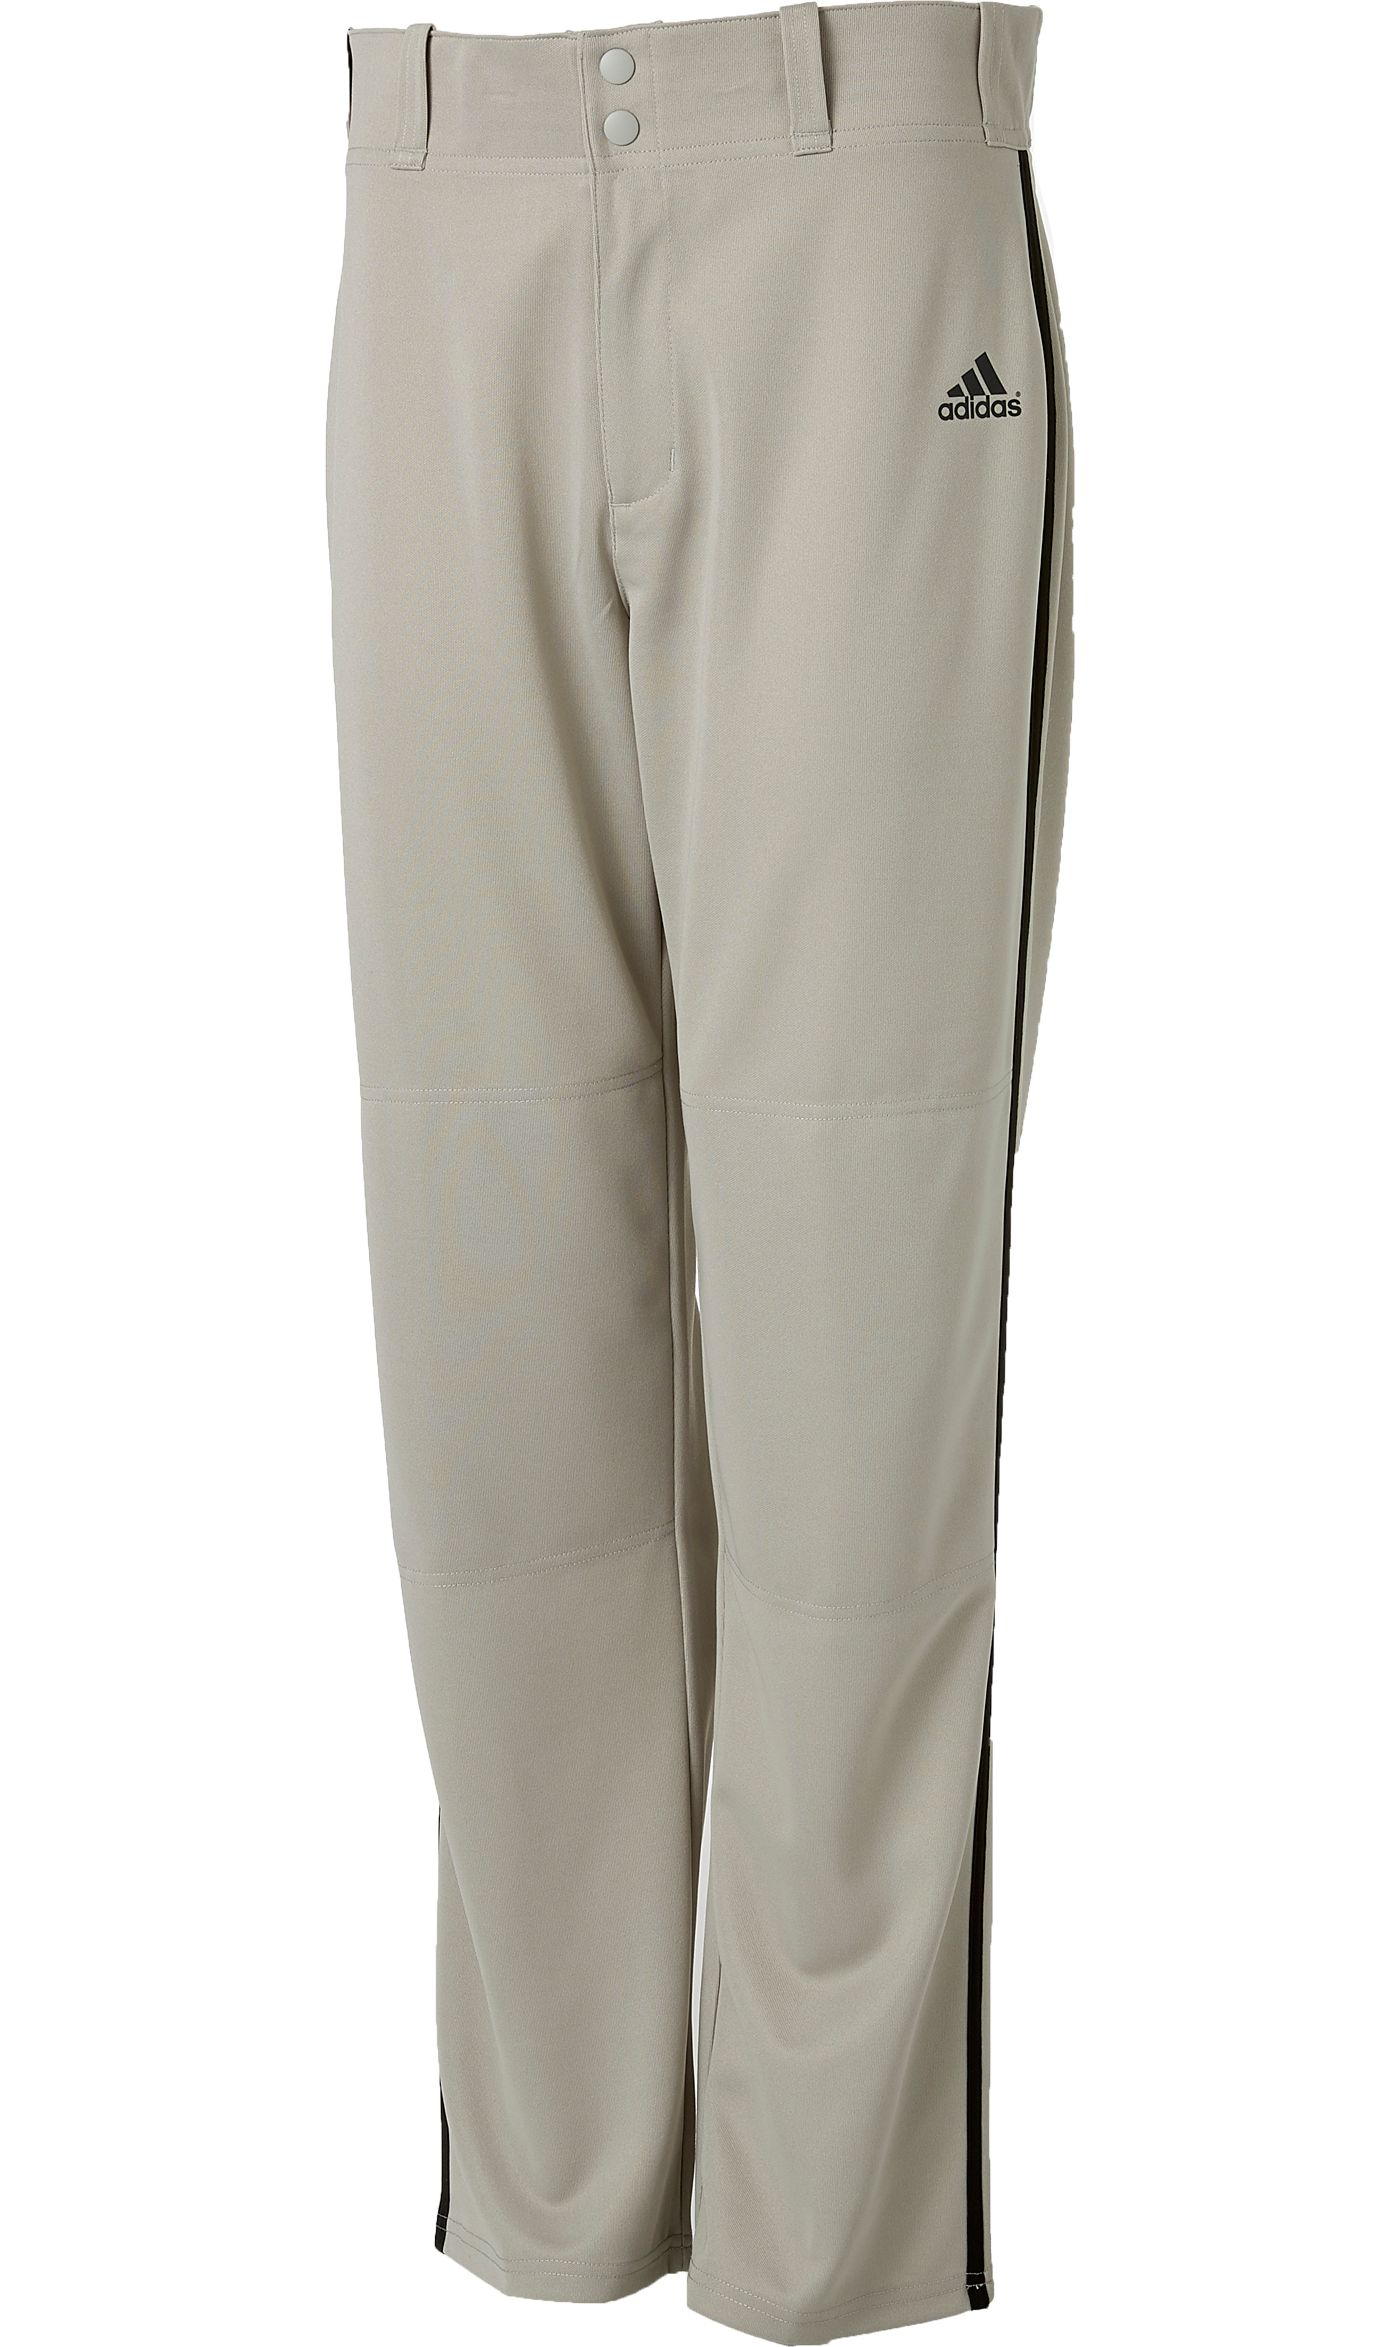 adidas Men's Triple Stripe Open Bottom Piped Baseball Pants